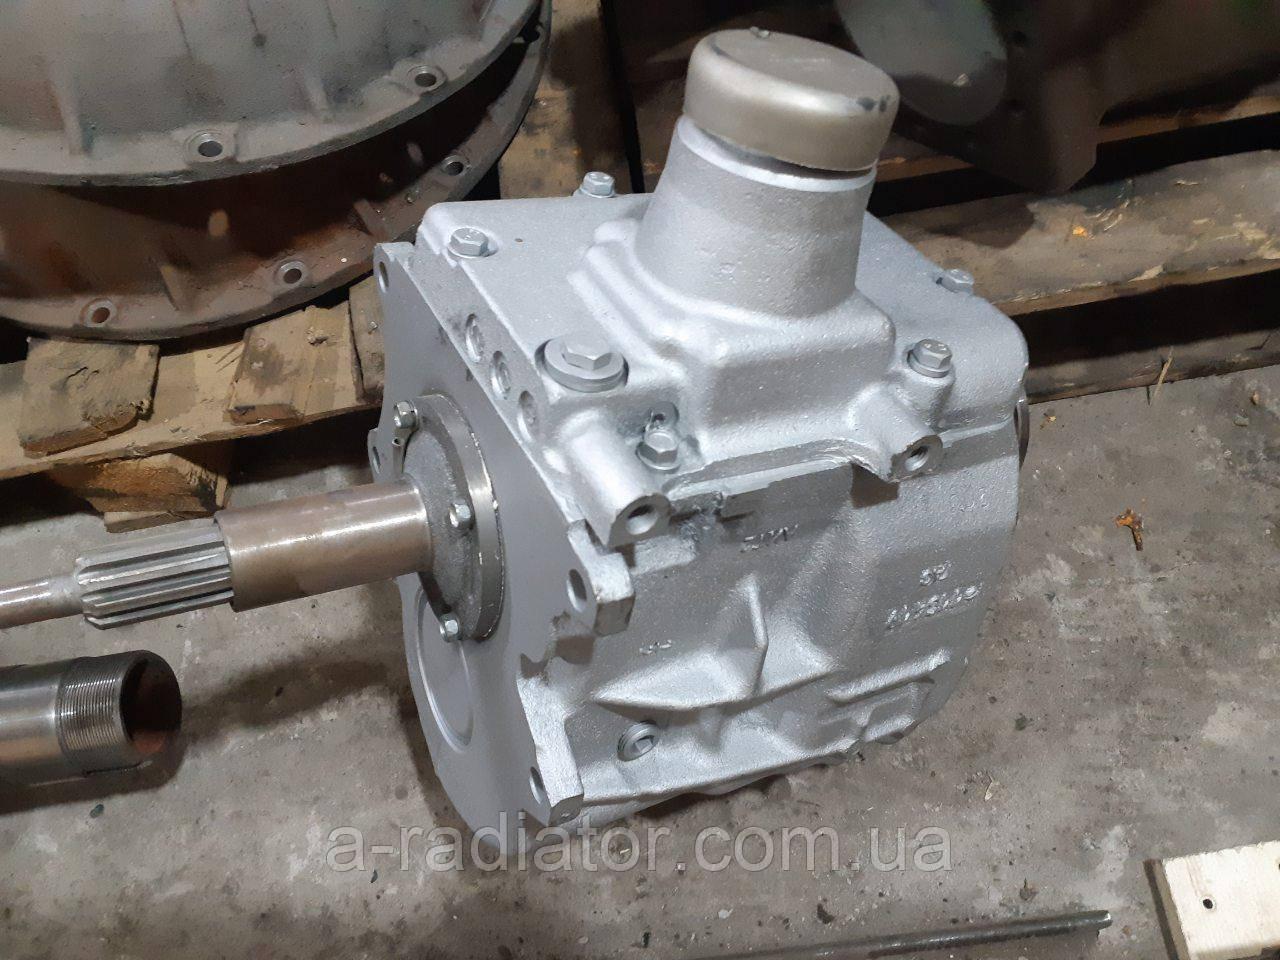 КПП ГАЗ 53, 3307 с кругл.фл. (пр-во ГАЗ)